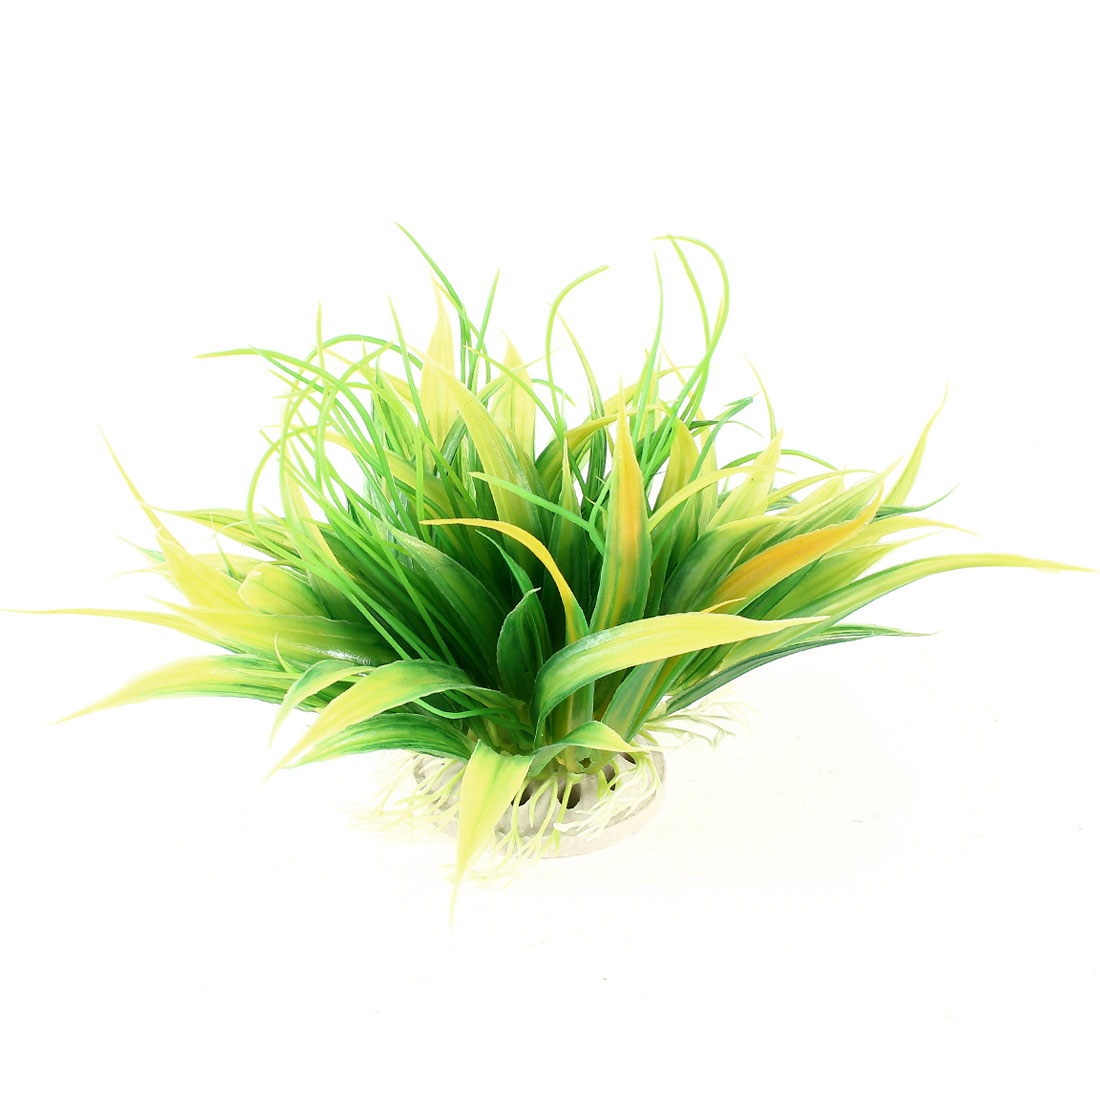 Unique Bargains 4.3 Inch Yellow Green Underwater Plants Grass for Fish Tank Aquarium Decoration